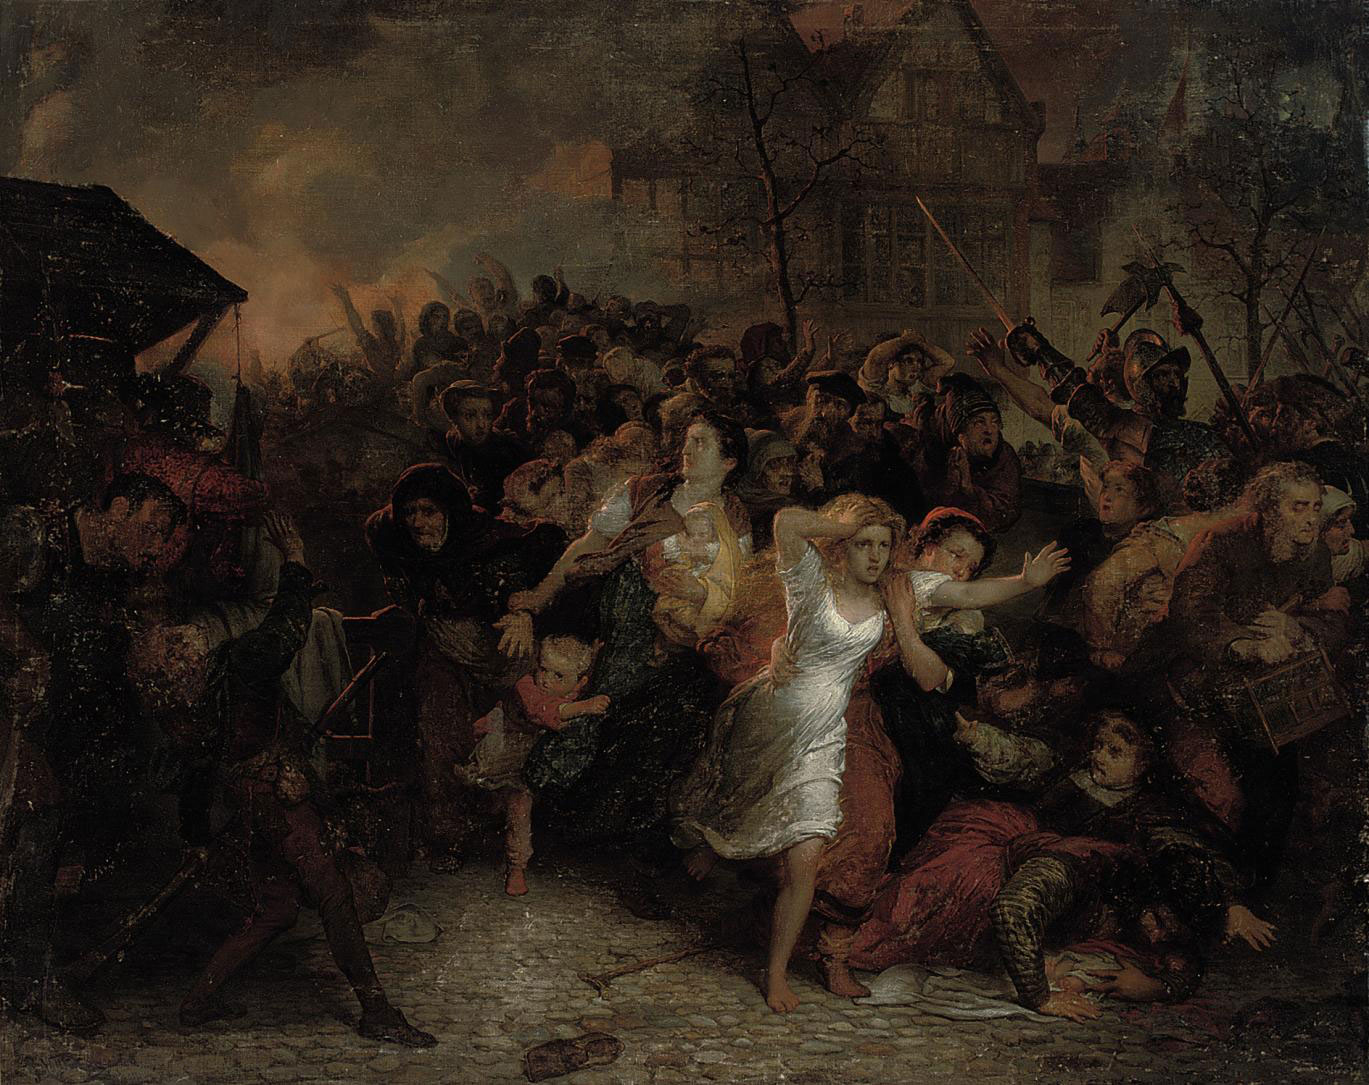 The siege of Antwerp